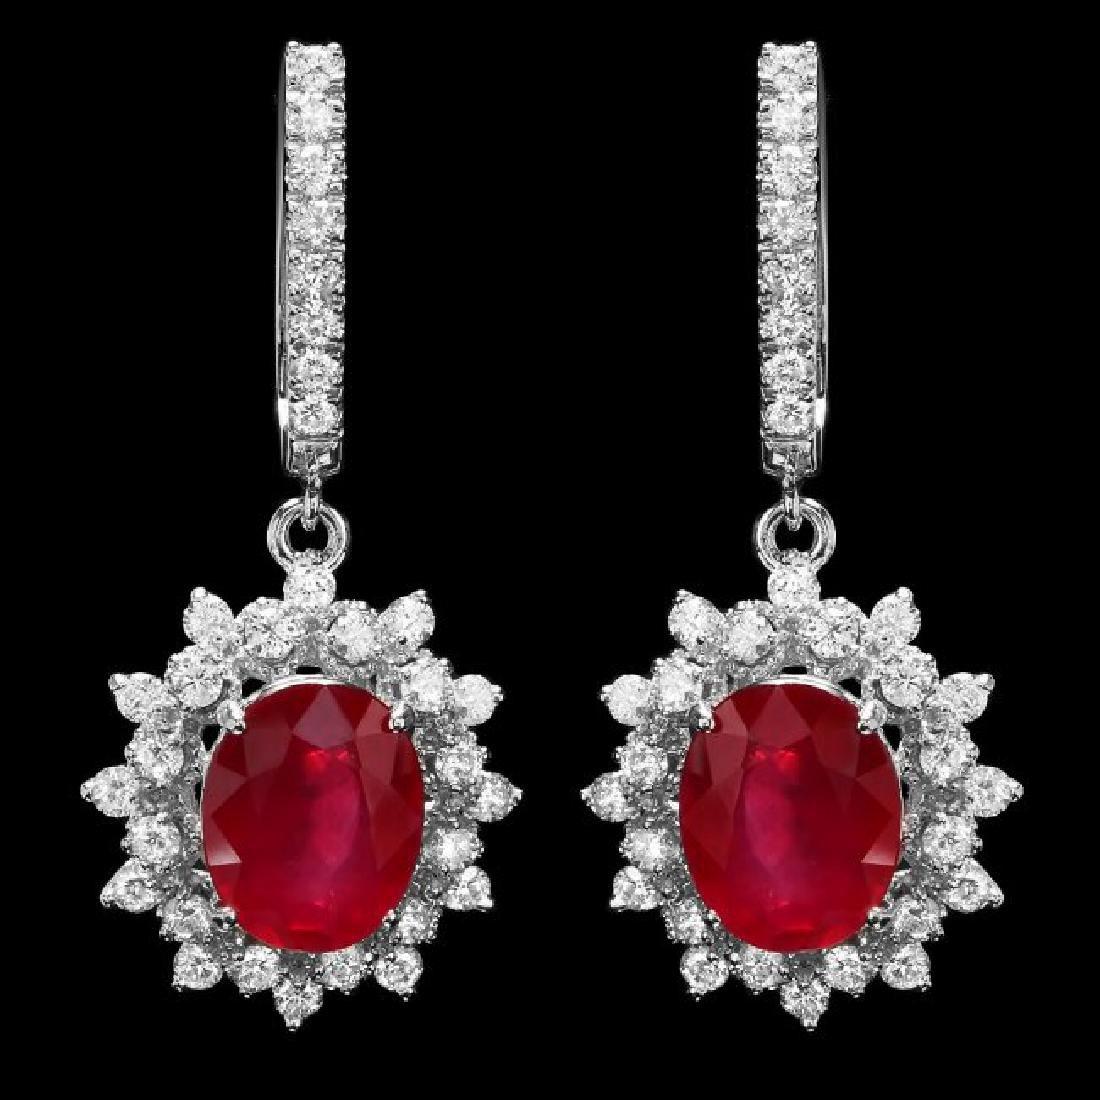 14k White Gold 7.6ct Ruby 1.70ct Diamond Earrings - 2